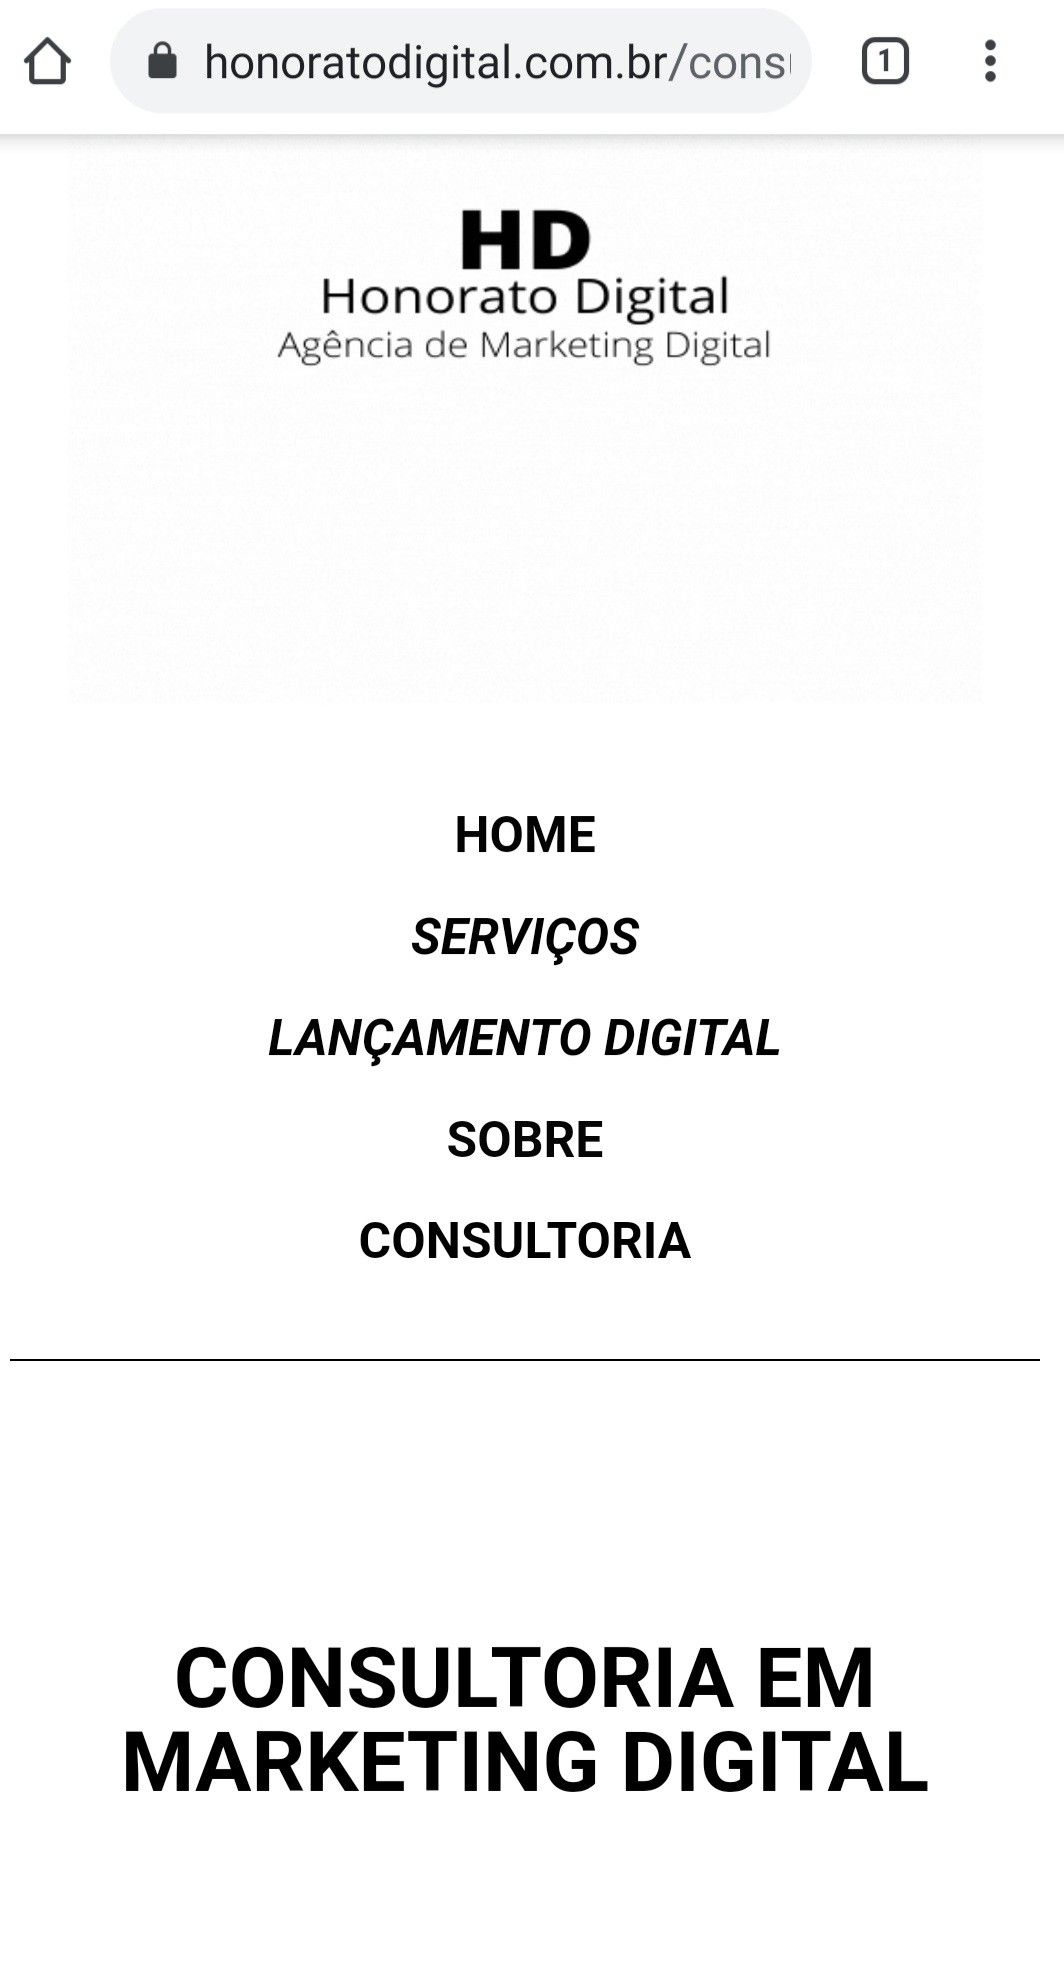 Consultoria Honorato Digital